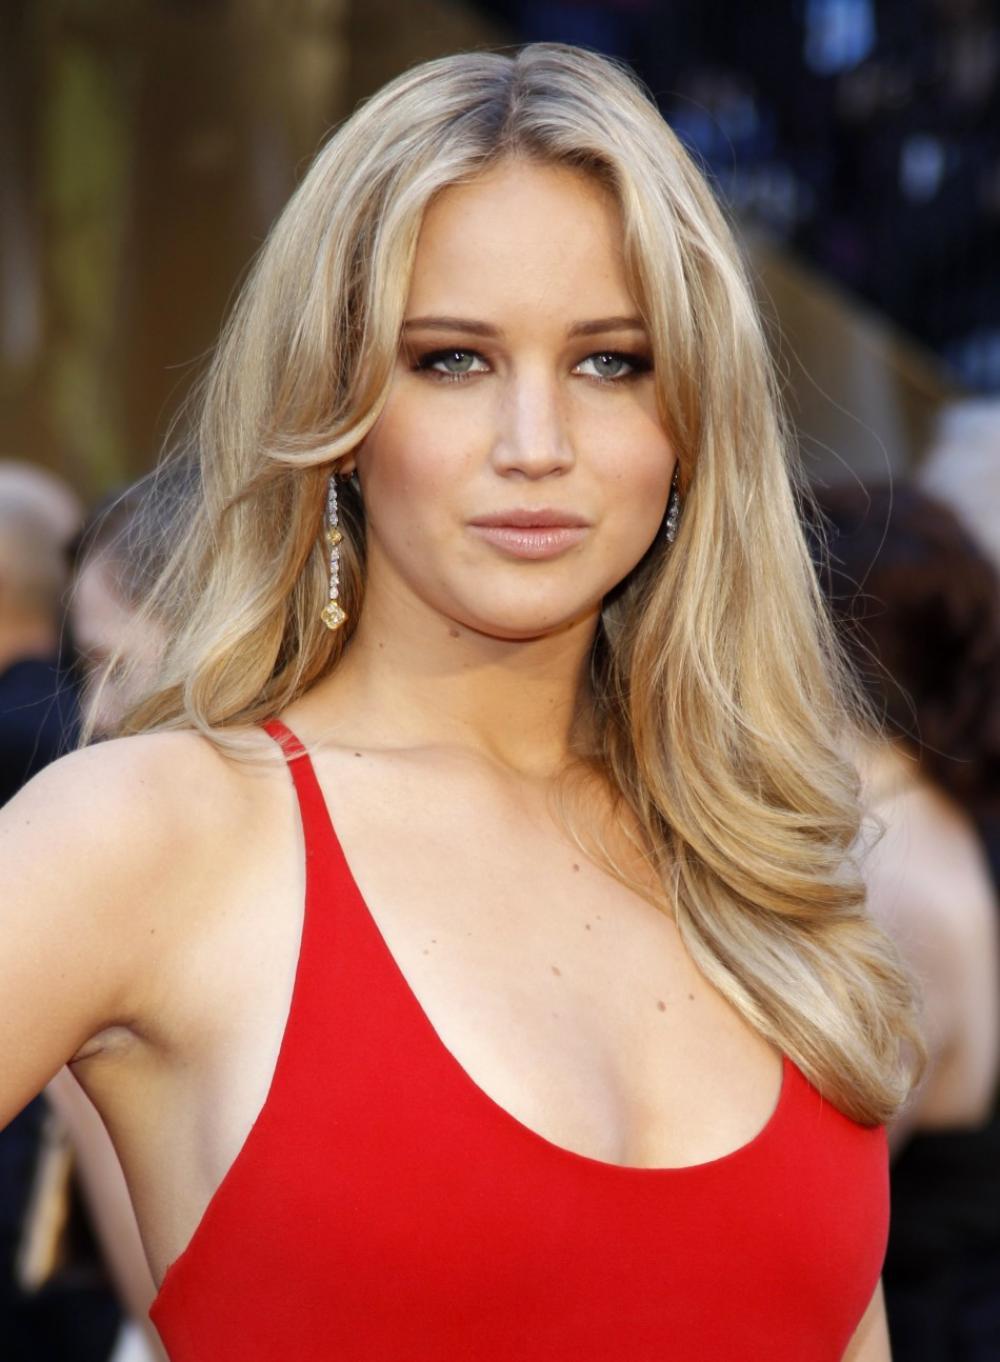 Jennifer Lawrence NUDE photos leaked: Star calls intrusion